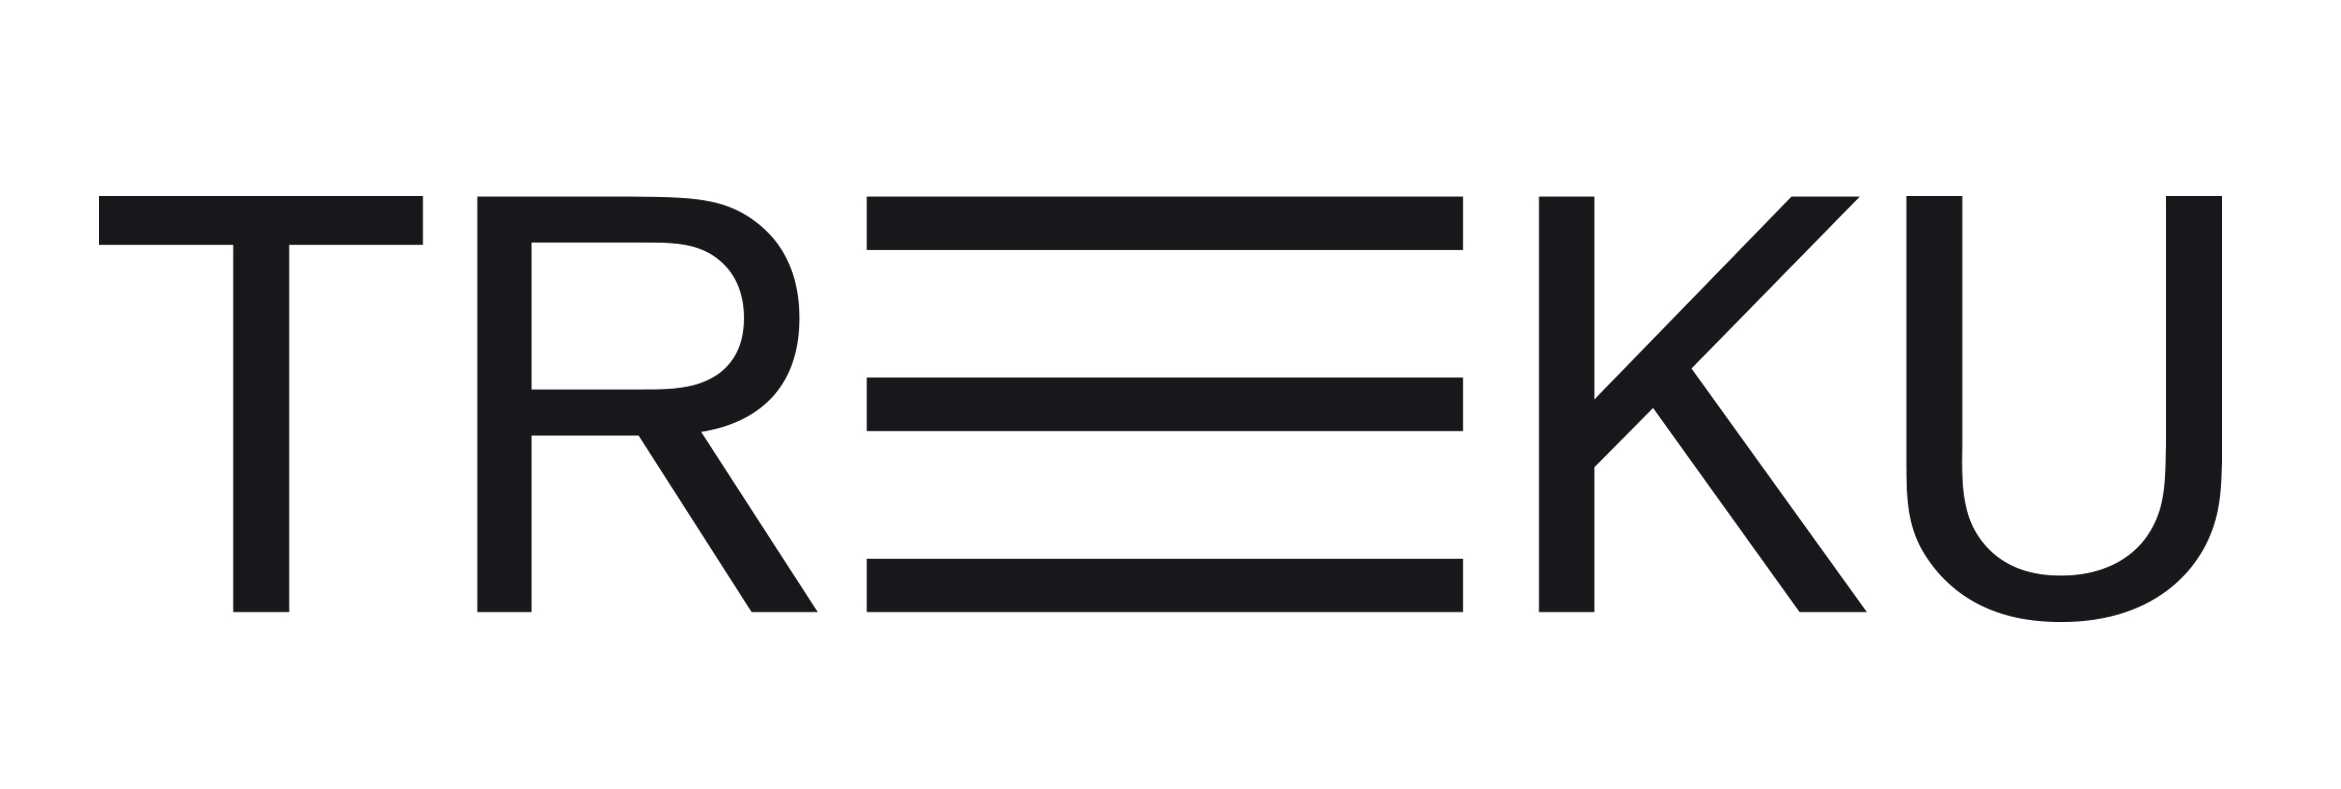 Treku logo_noes